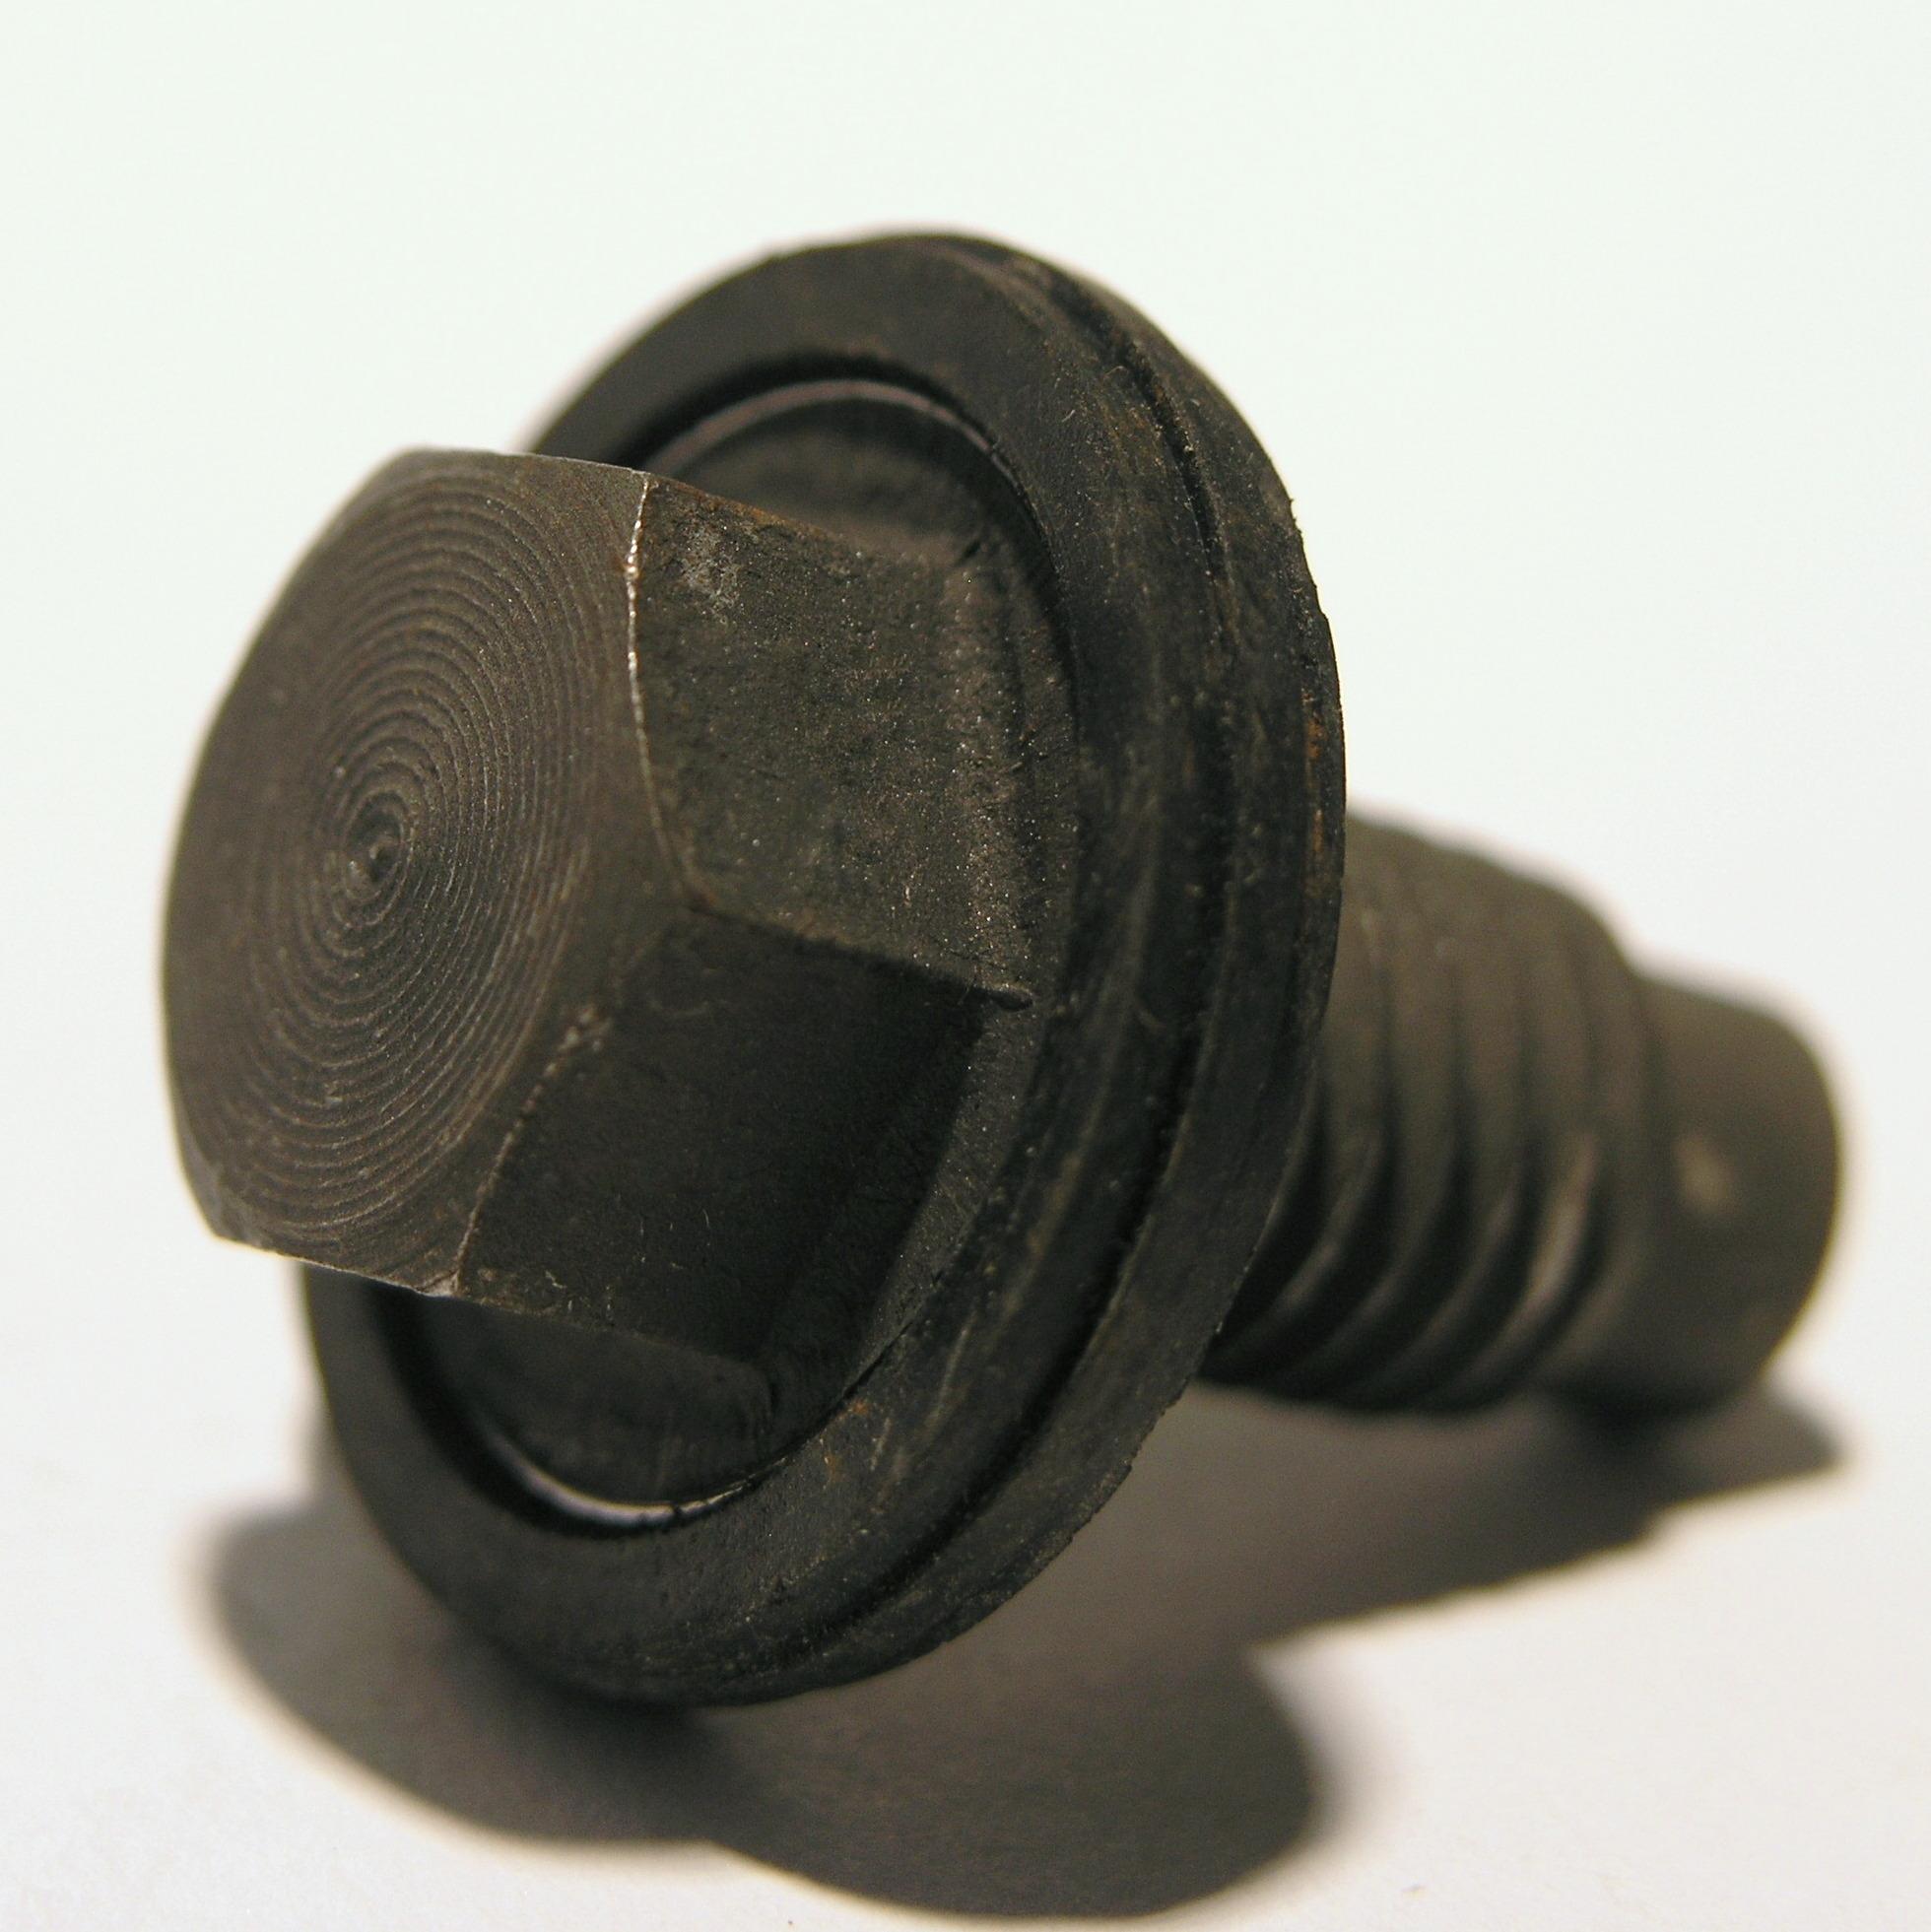 sump-plug-with-15mm-hex-head-thread-m12-x-1.5-thread-length-21mm-overall-length-32.5mm.jpg